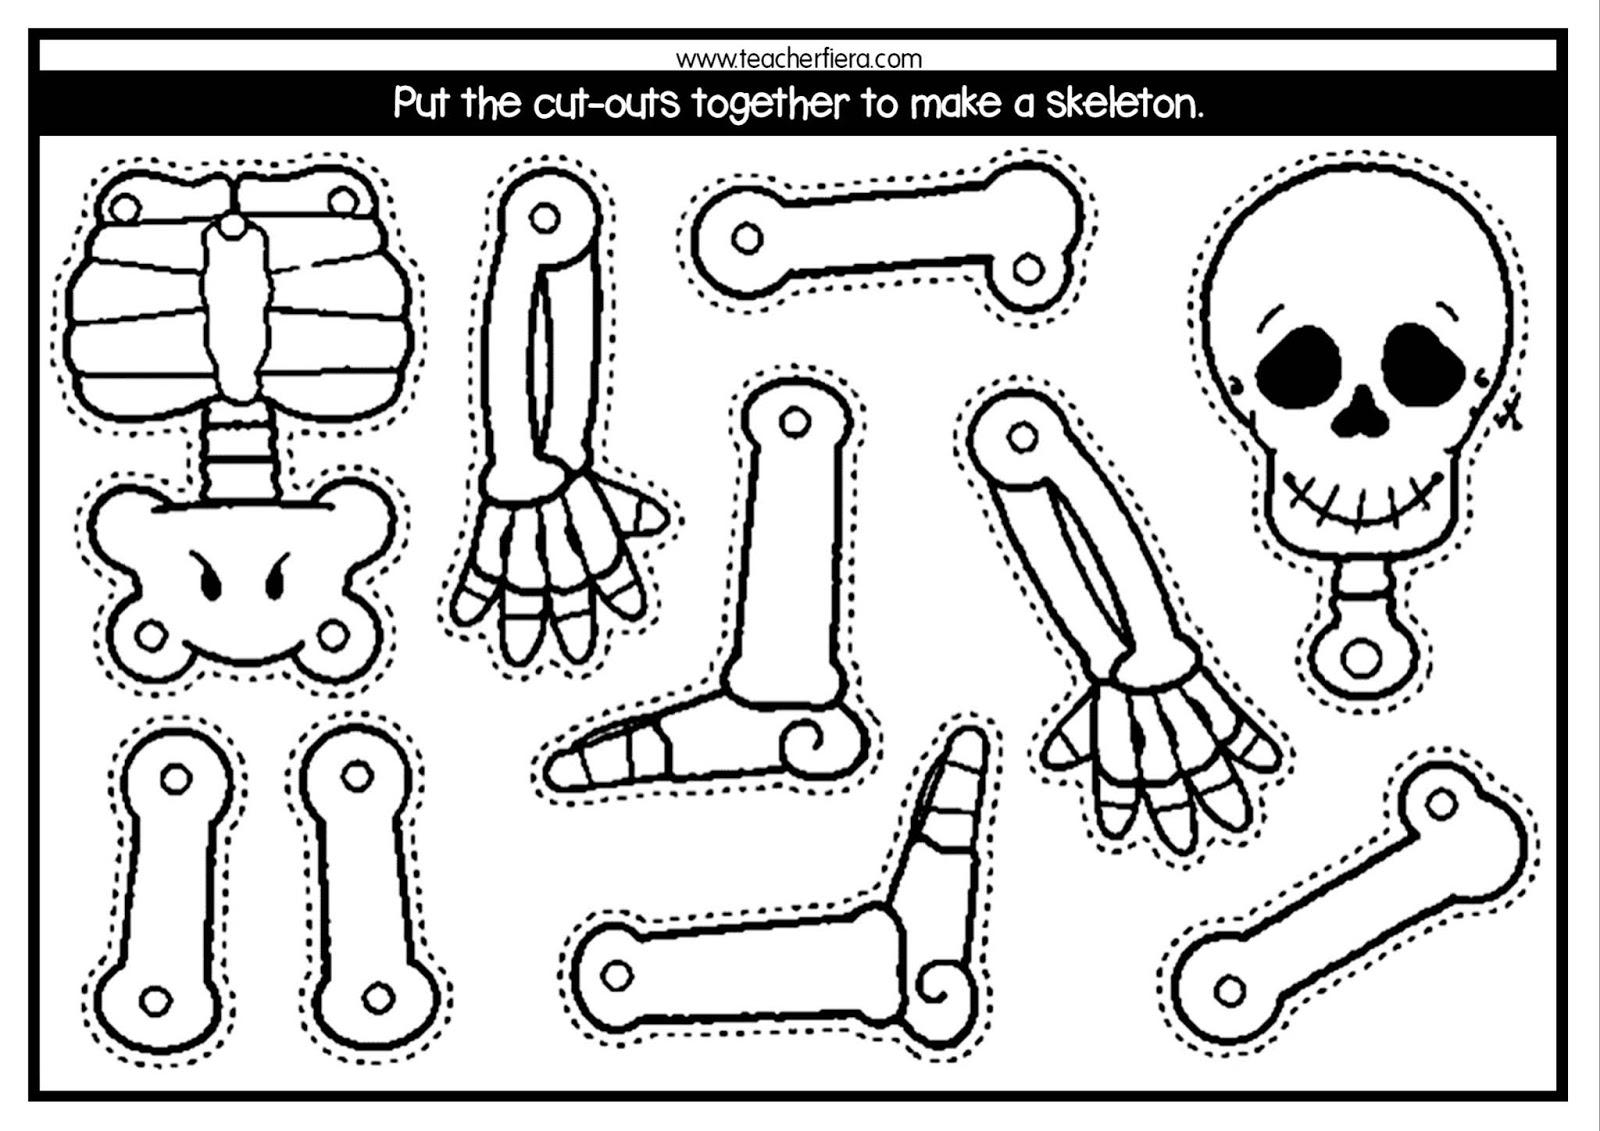 Teacherfiera Year 2 Unit 8 Assembling The Skeleton